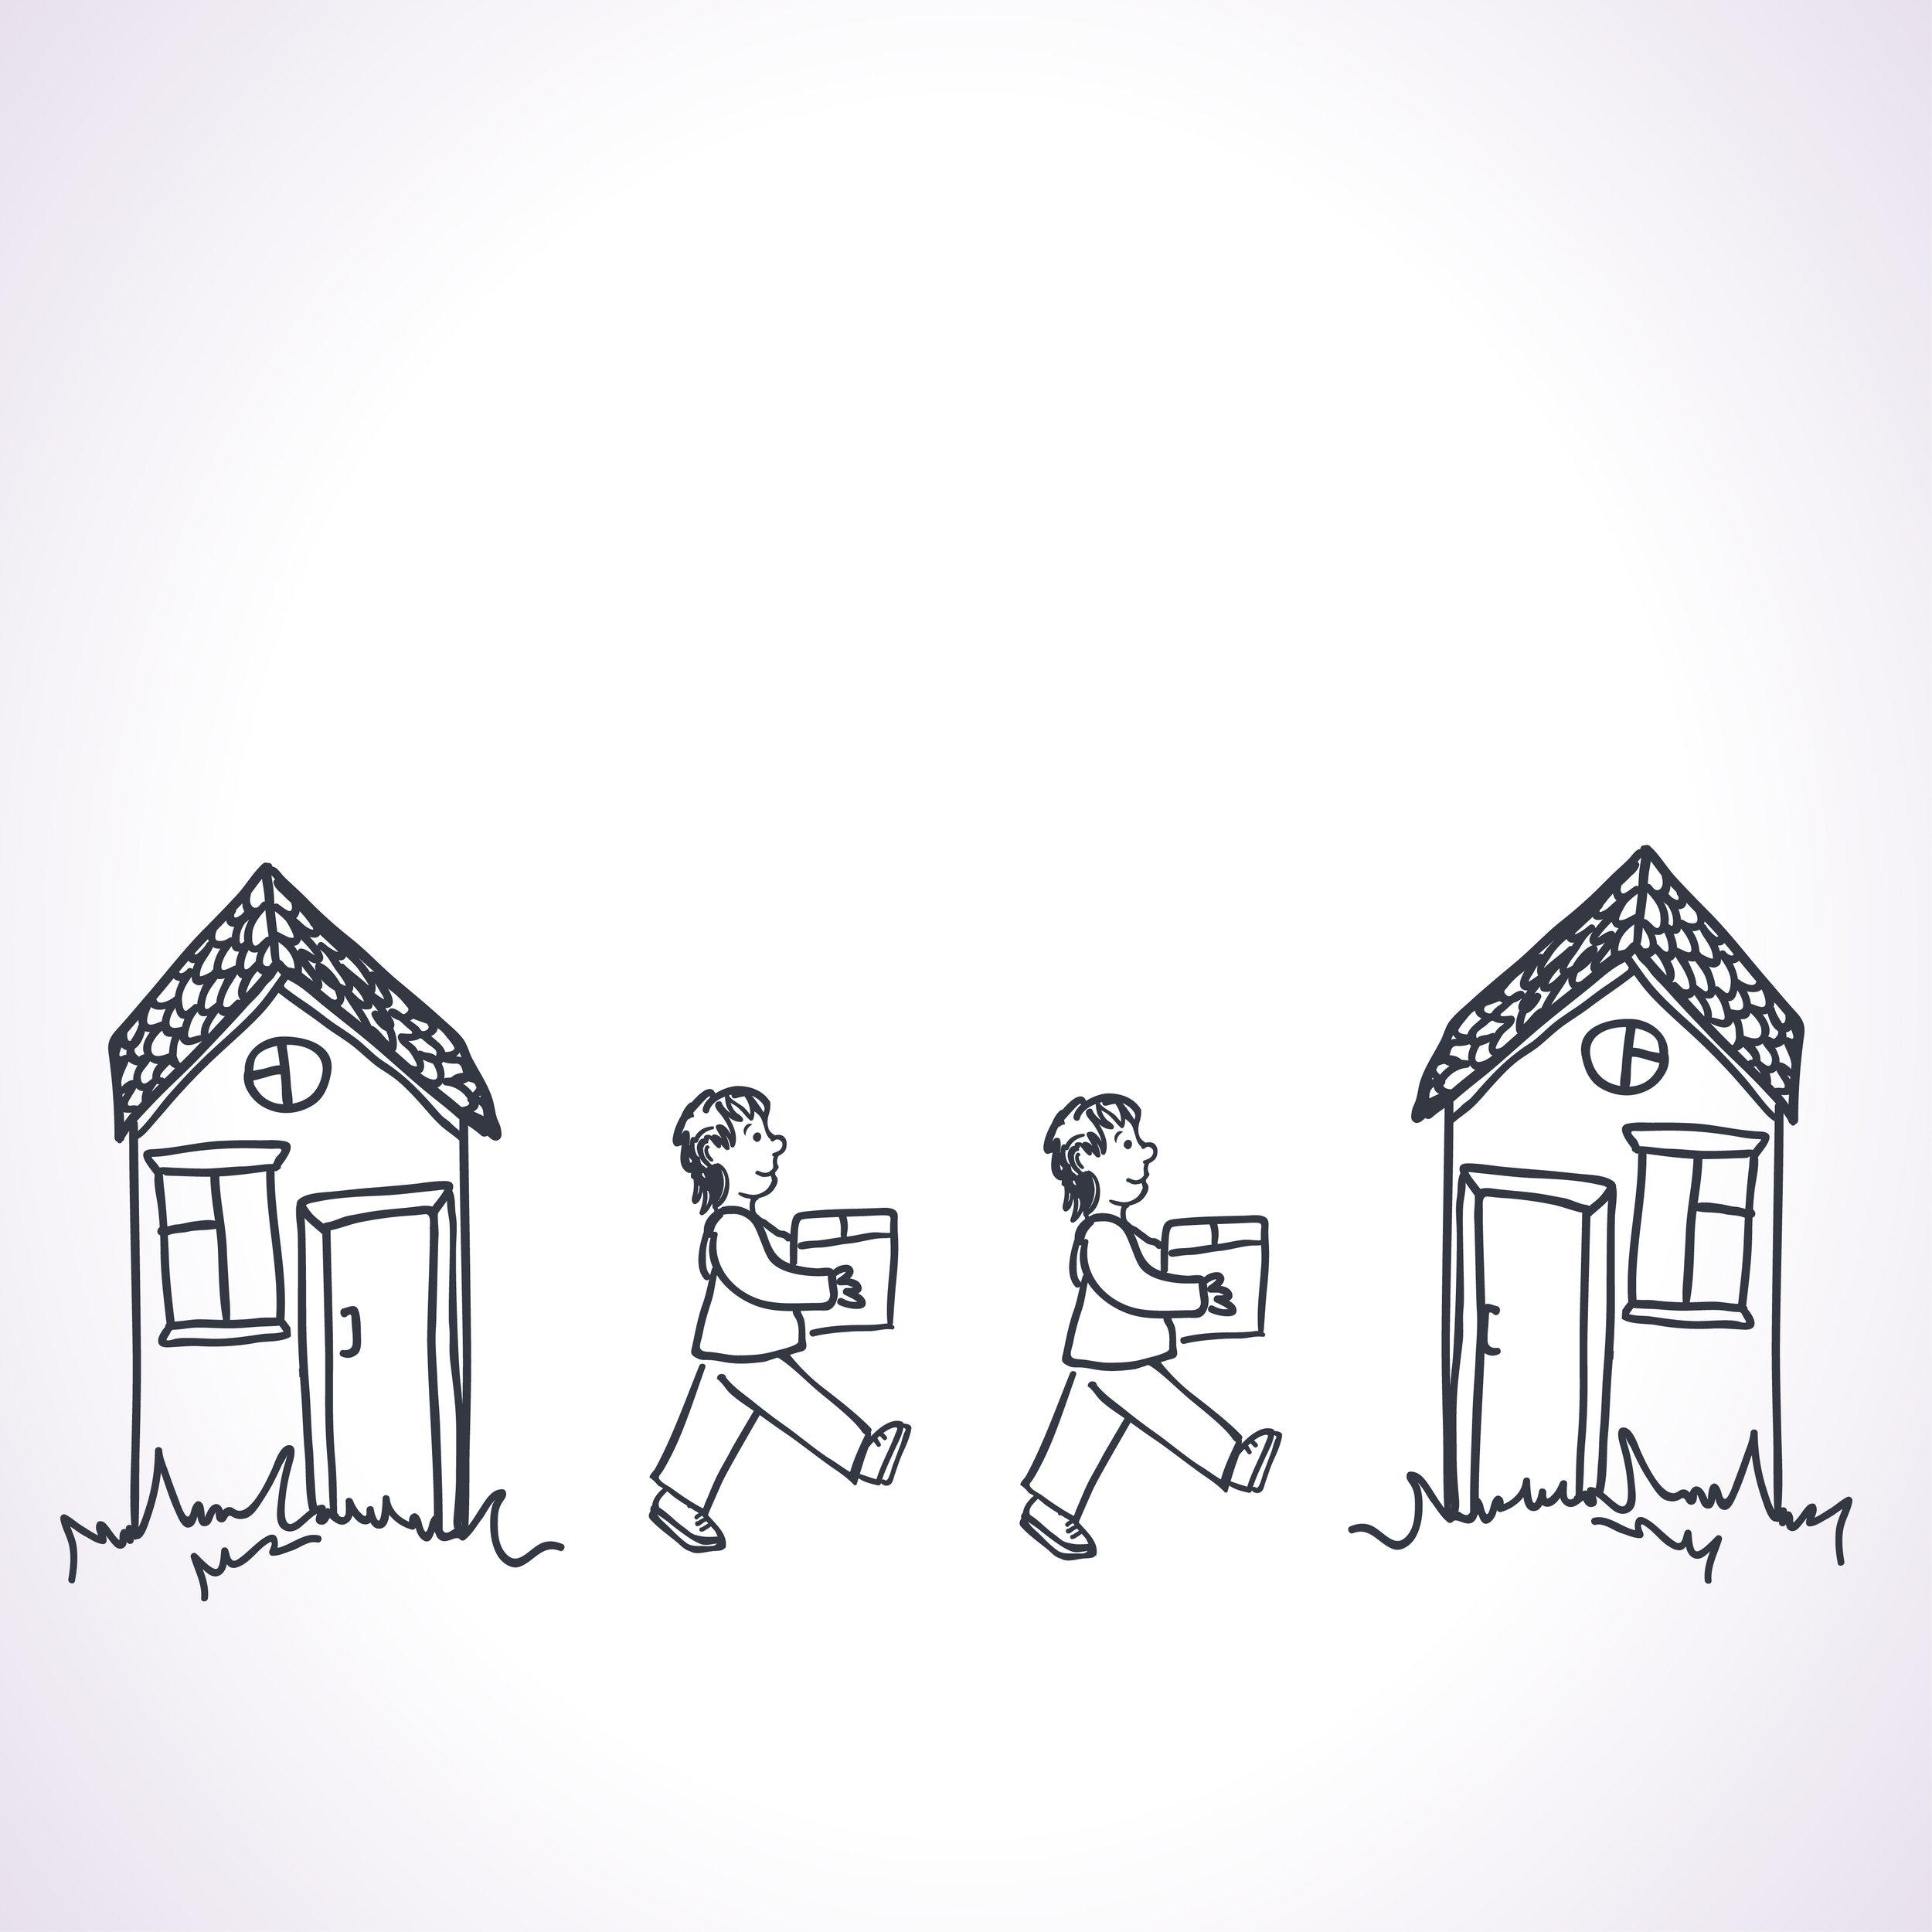 change of address - an illustration